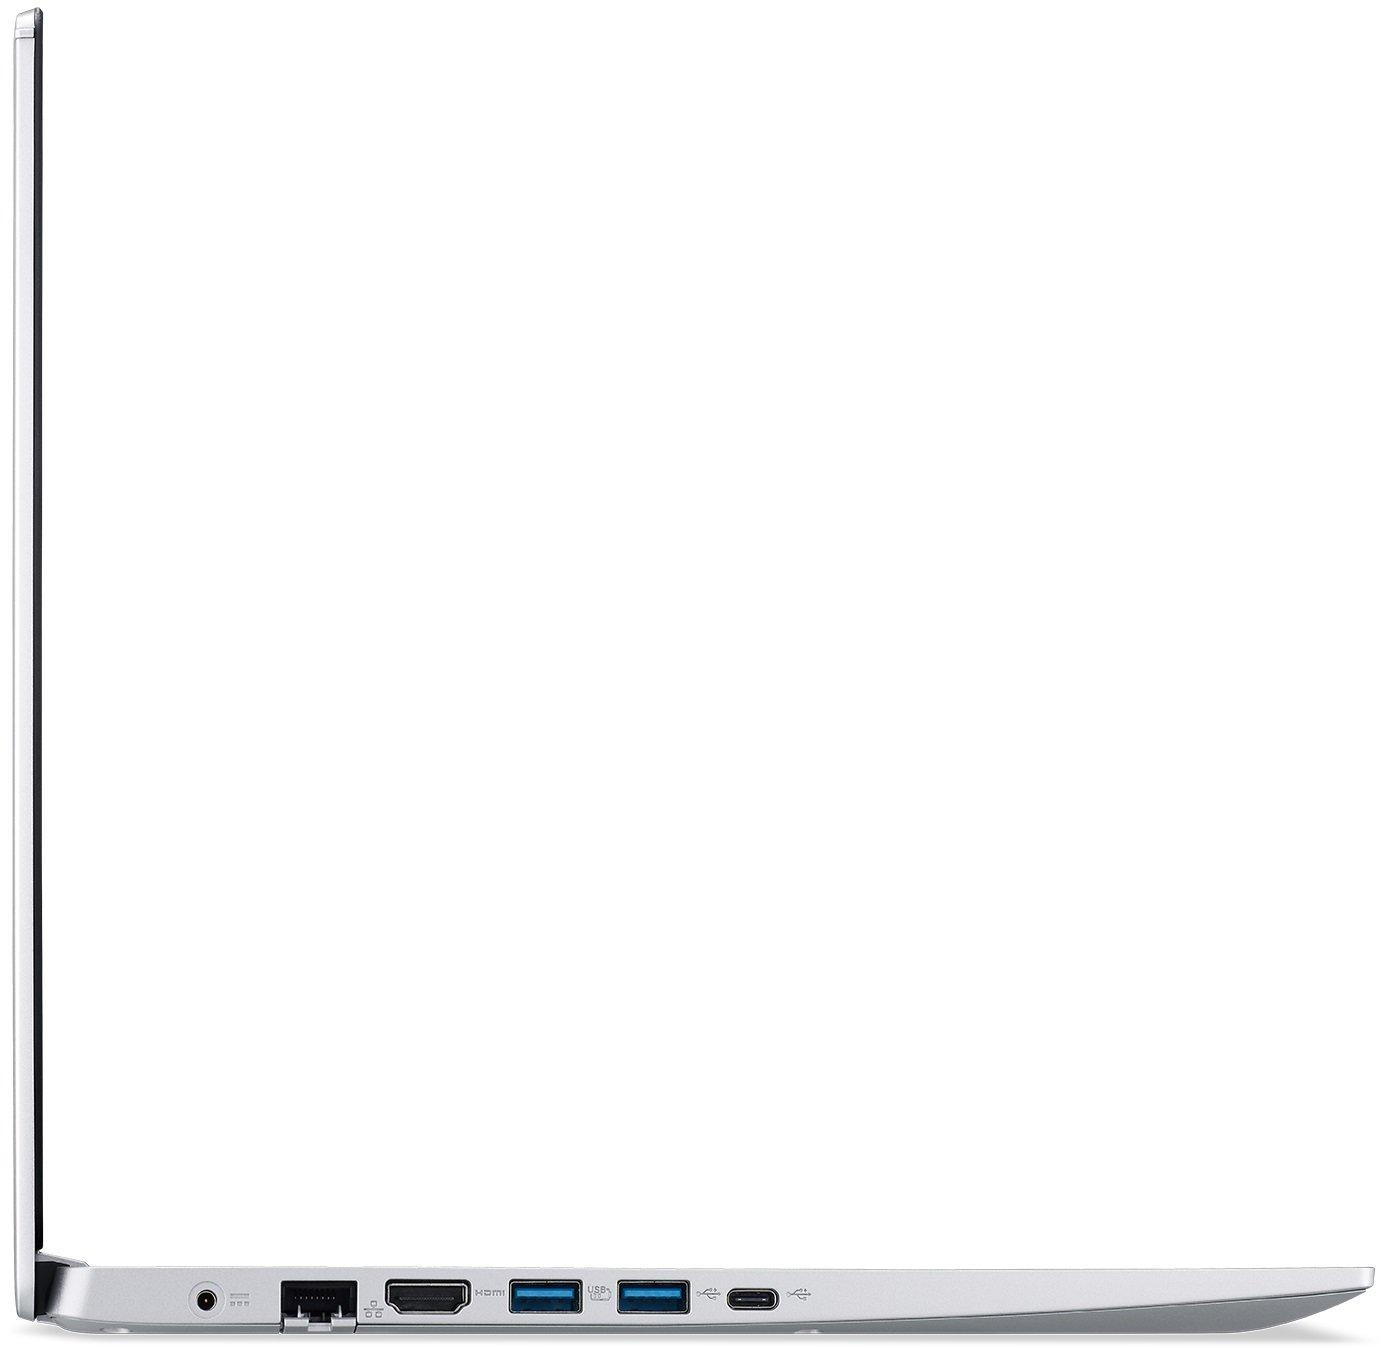 Ноутбук Acer Aspire 5 A515-44 (NX.HW4EU.00Z) фото 5